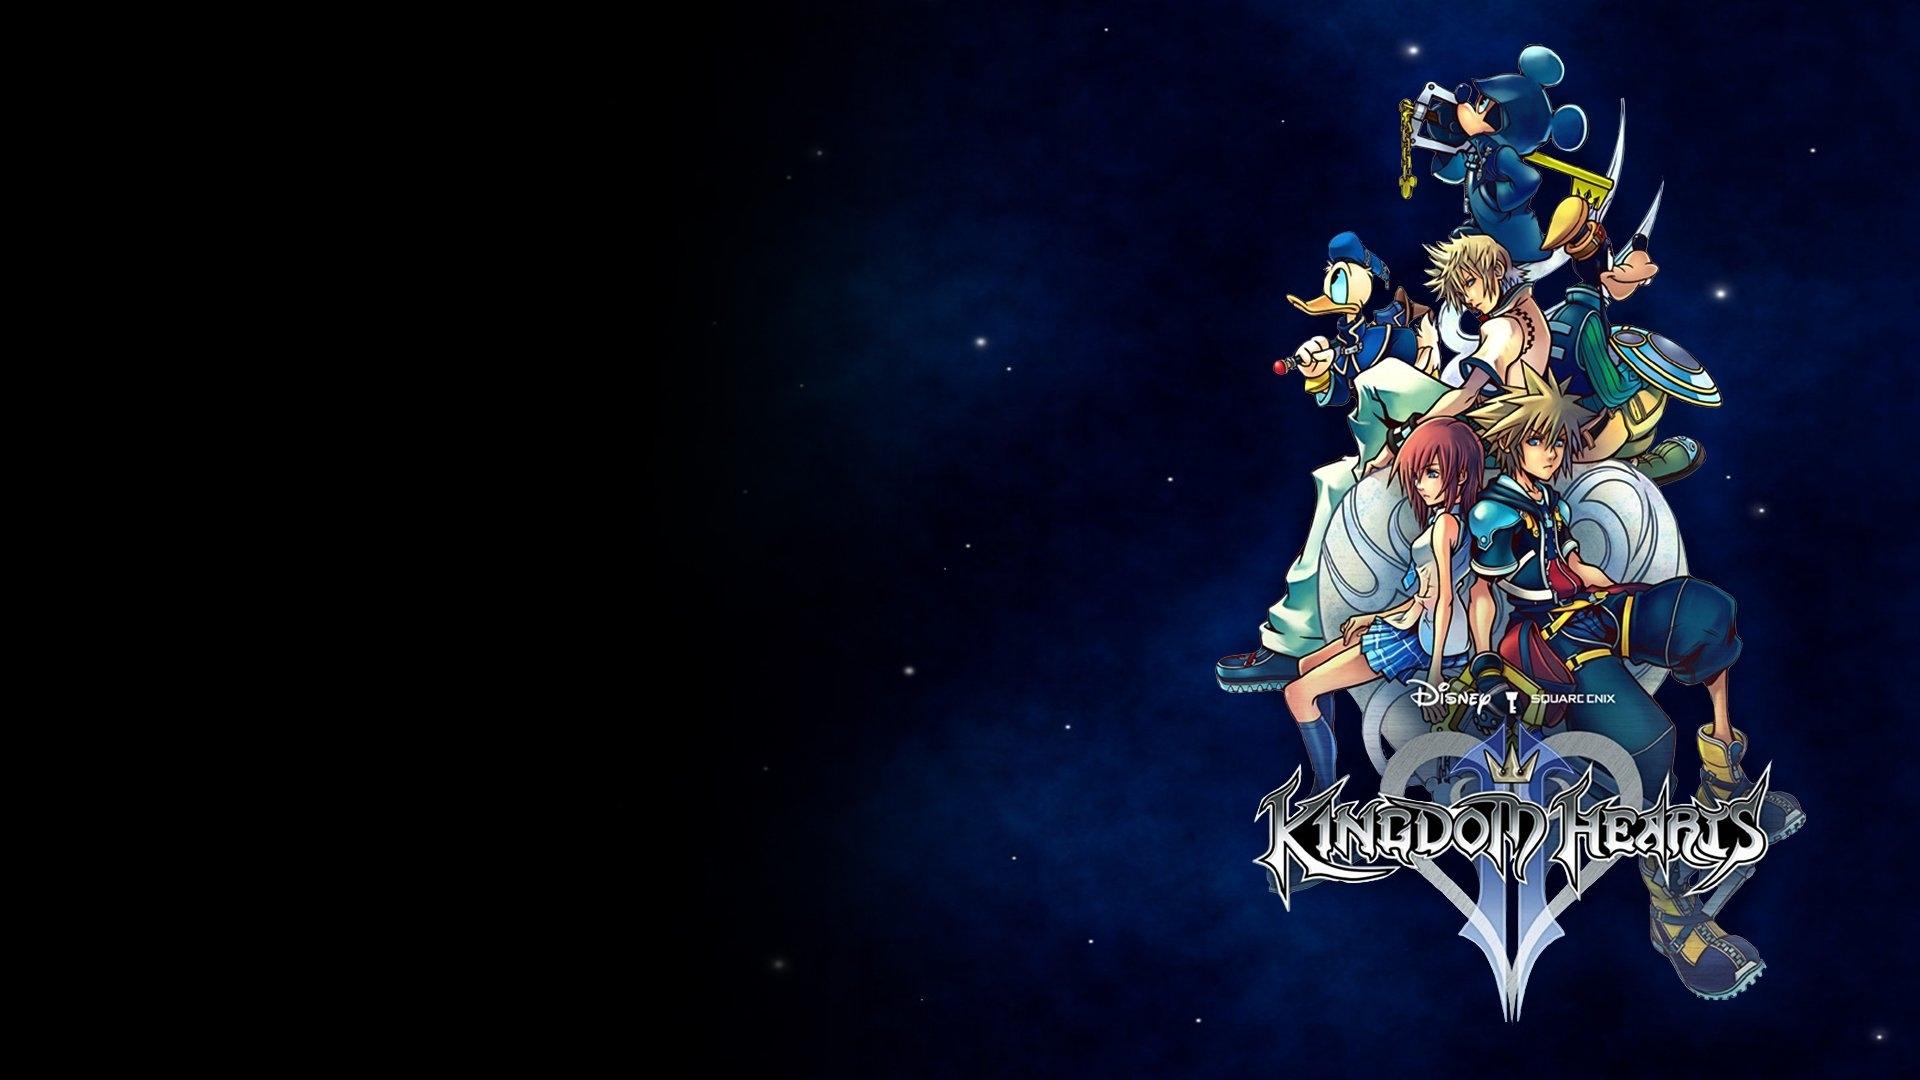 6 kingdom hearts ii fonds d'écran hd | arrière-plans - wallpaper abyss